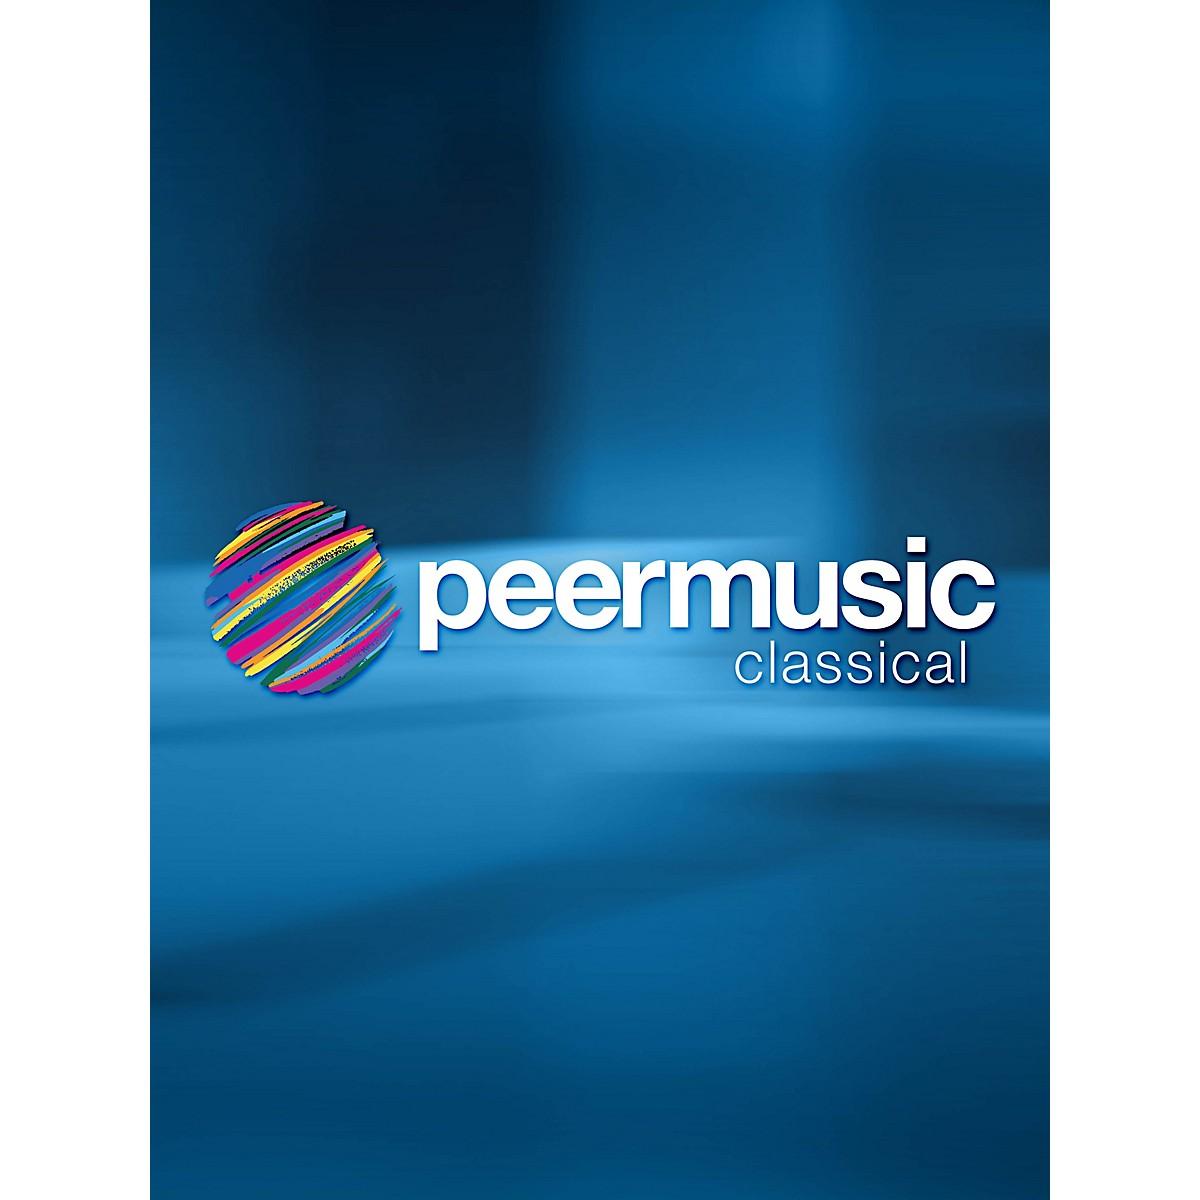 Peer Music Quintet (Woodwind Quintet Parts) Peermusic Classical Series Softcover  by Domingo Santa Cruz